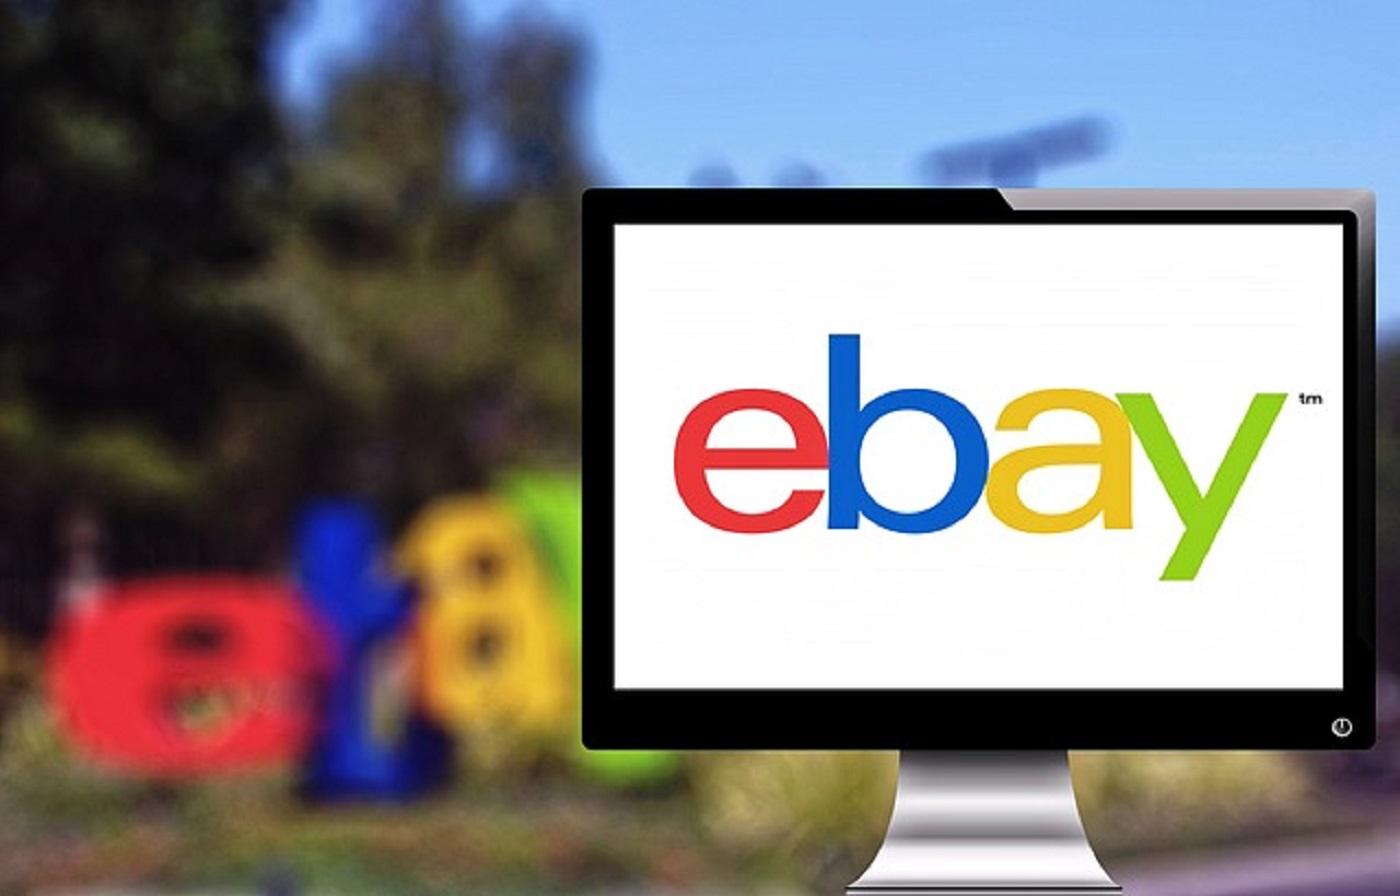 tutorial change ebay into pounds